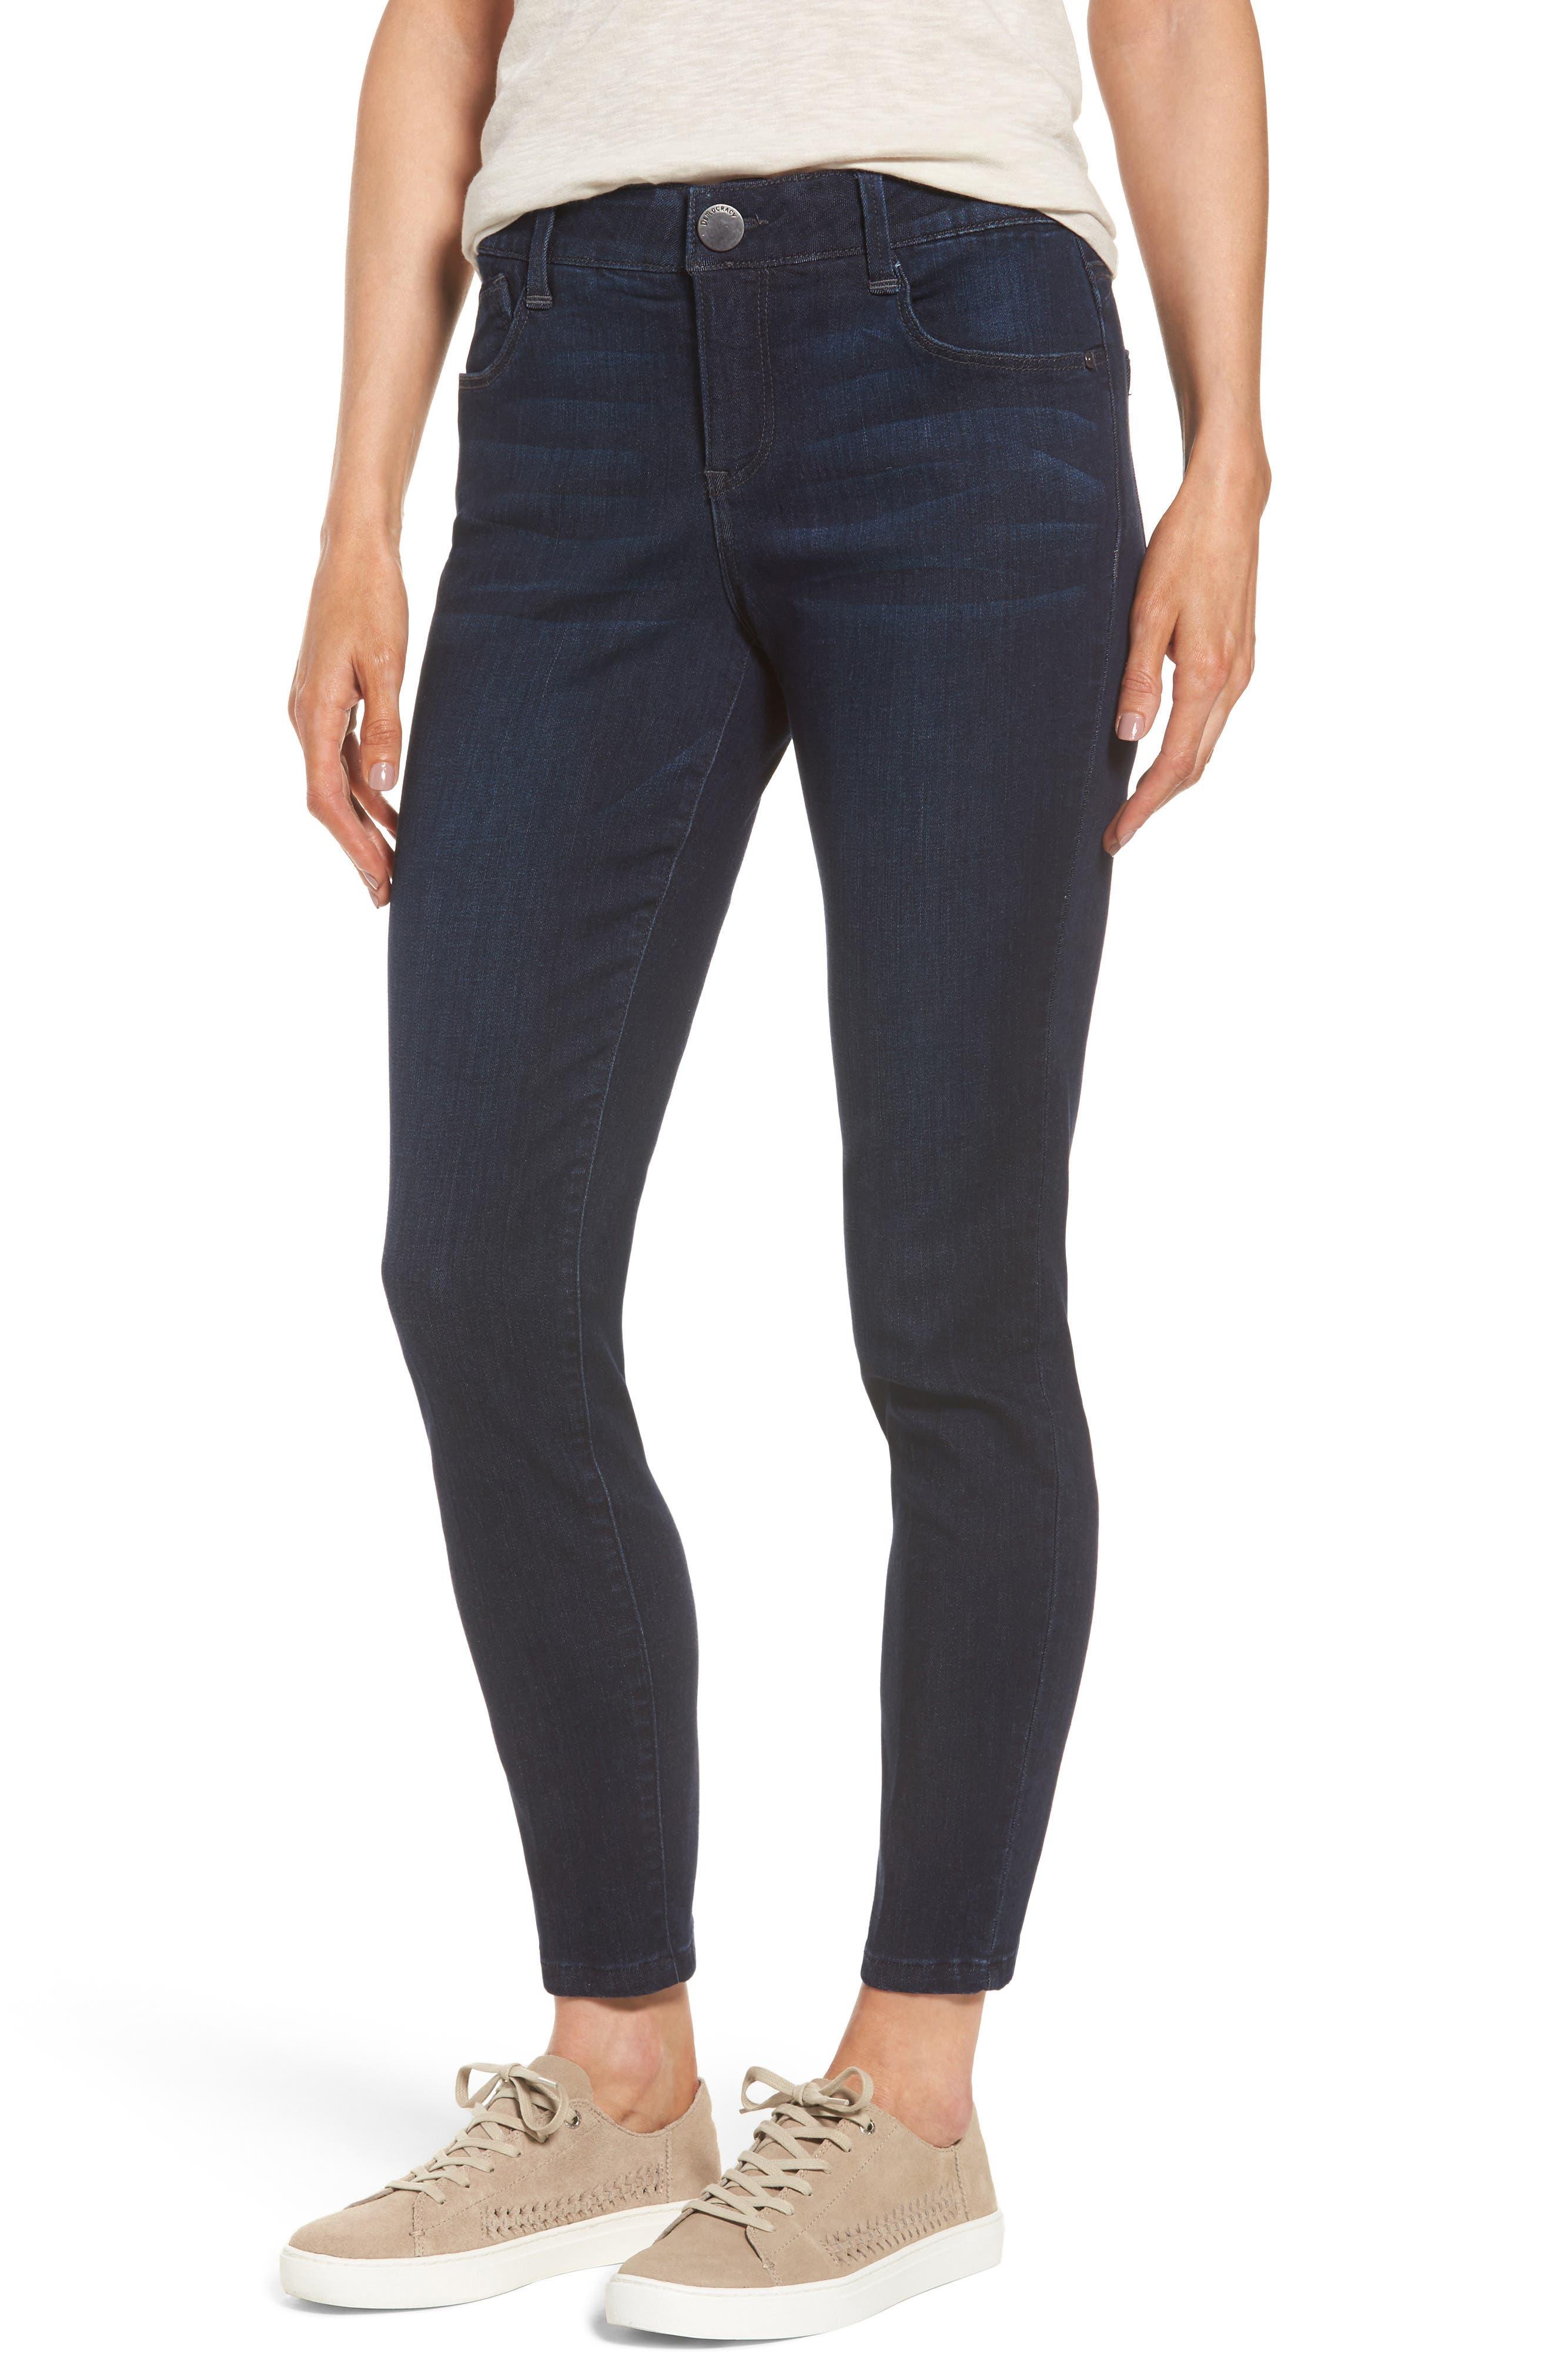 Ab-solution Ankle Skimmer Jeans,                         Main,                         color, Indigo